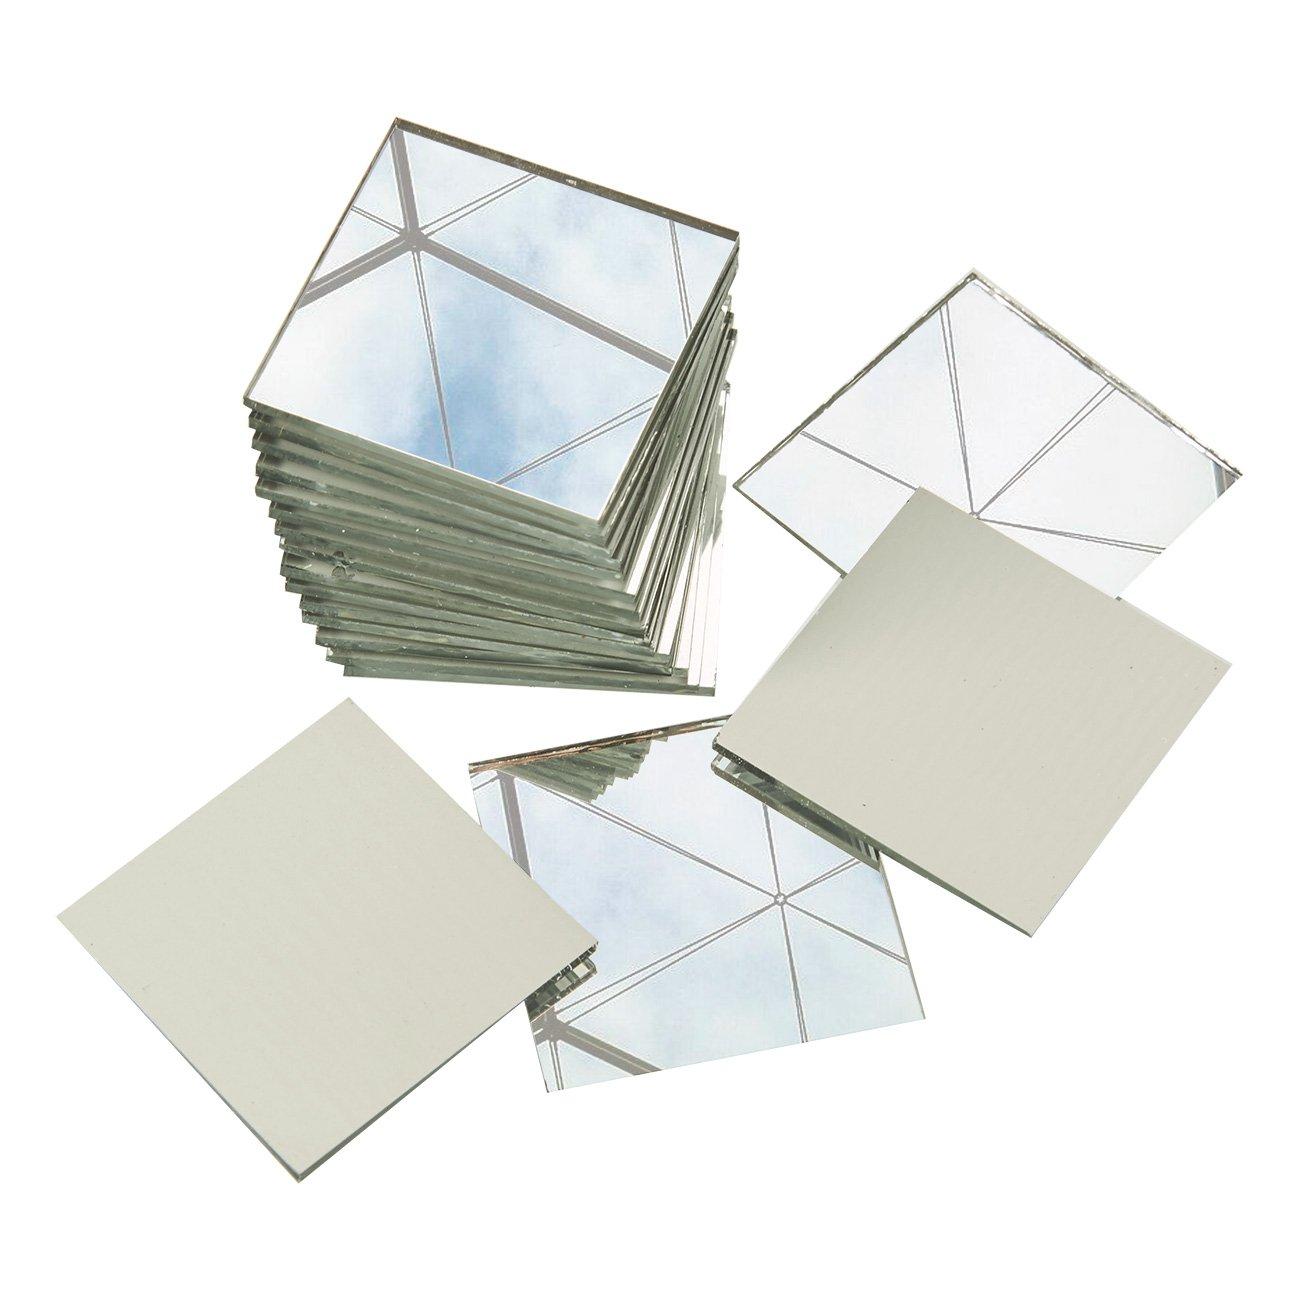 DETAILS Craft Mirrors 120 Pack Bulk Square